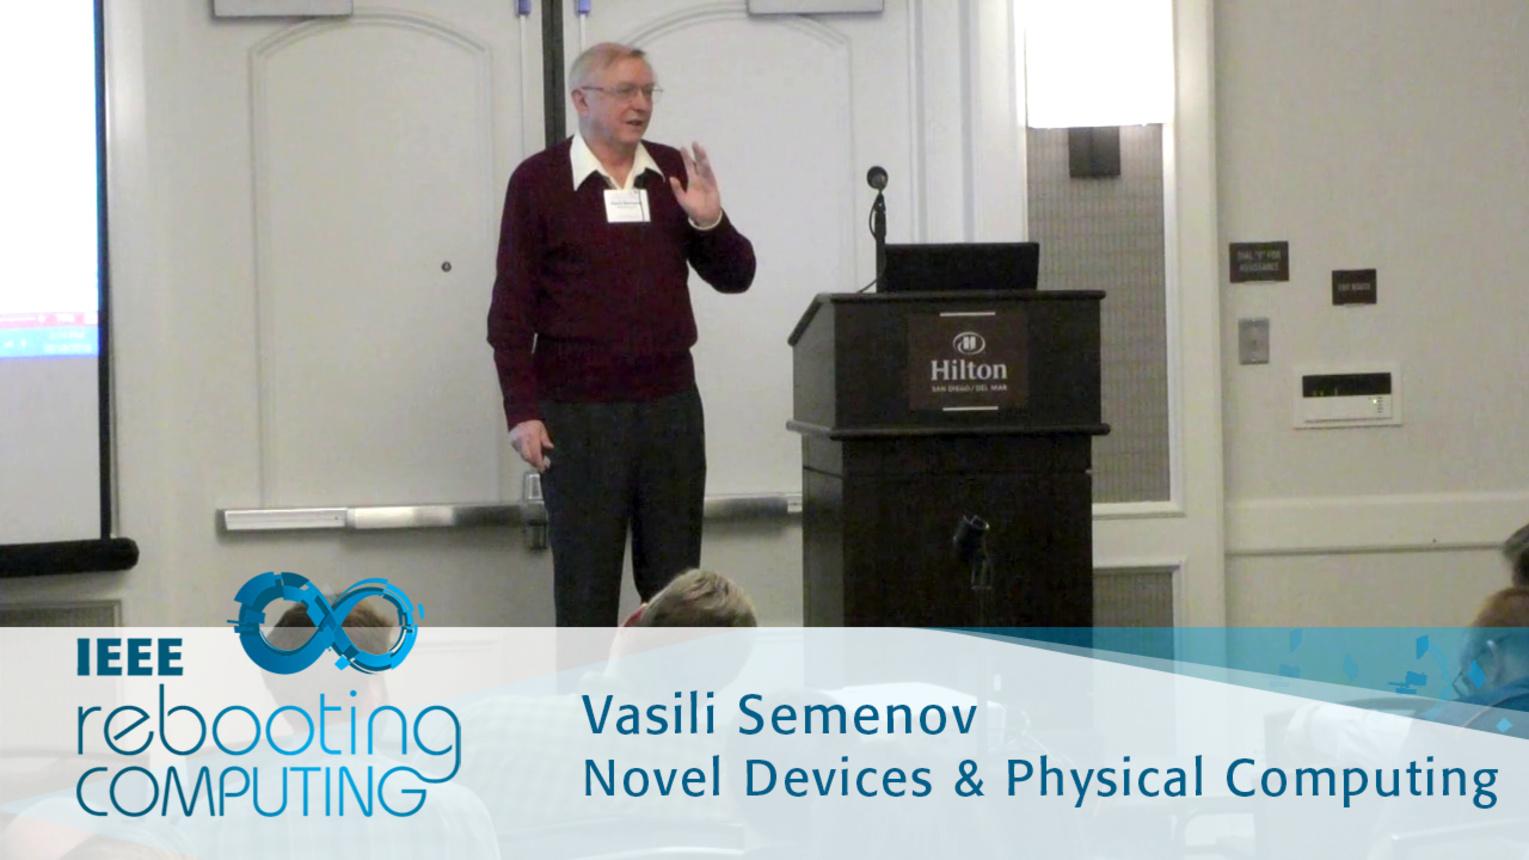 Erasing Logic-Memory Boundaries in Superconductor Electronics - Vasili Semenov: 2016 International Conference on Rebooting Computing